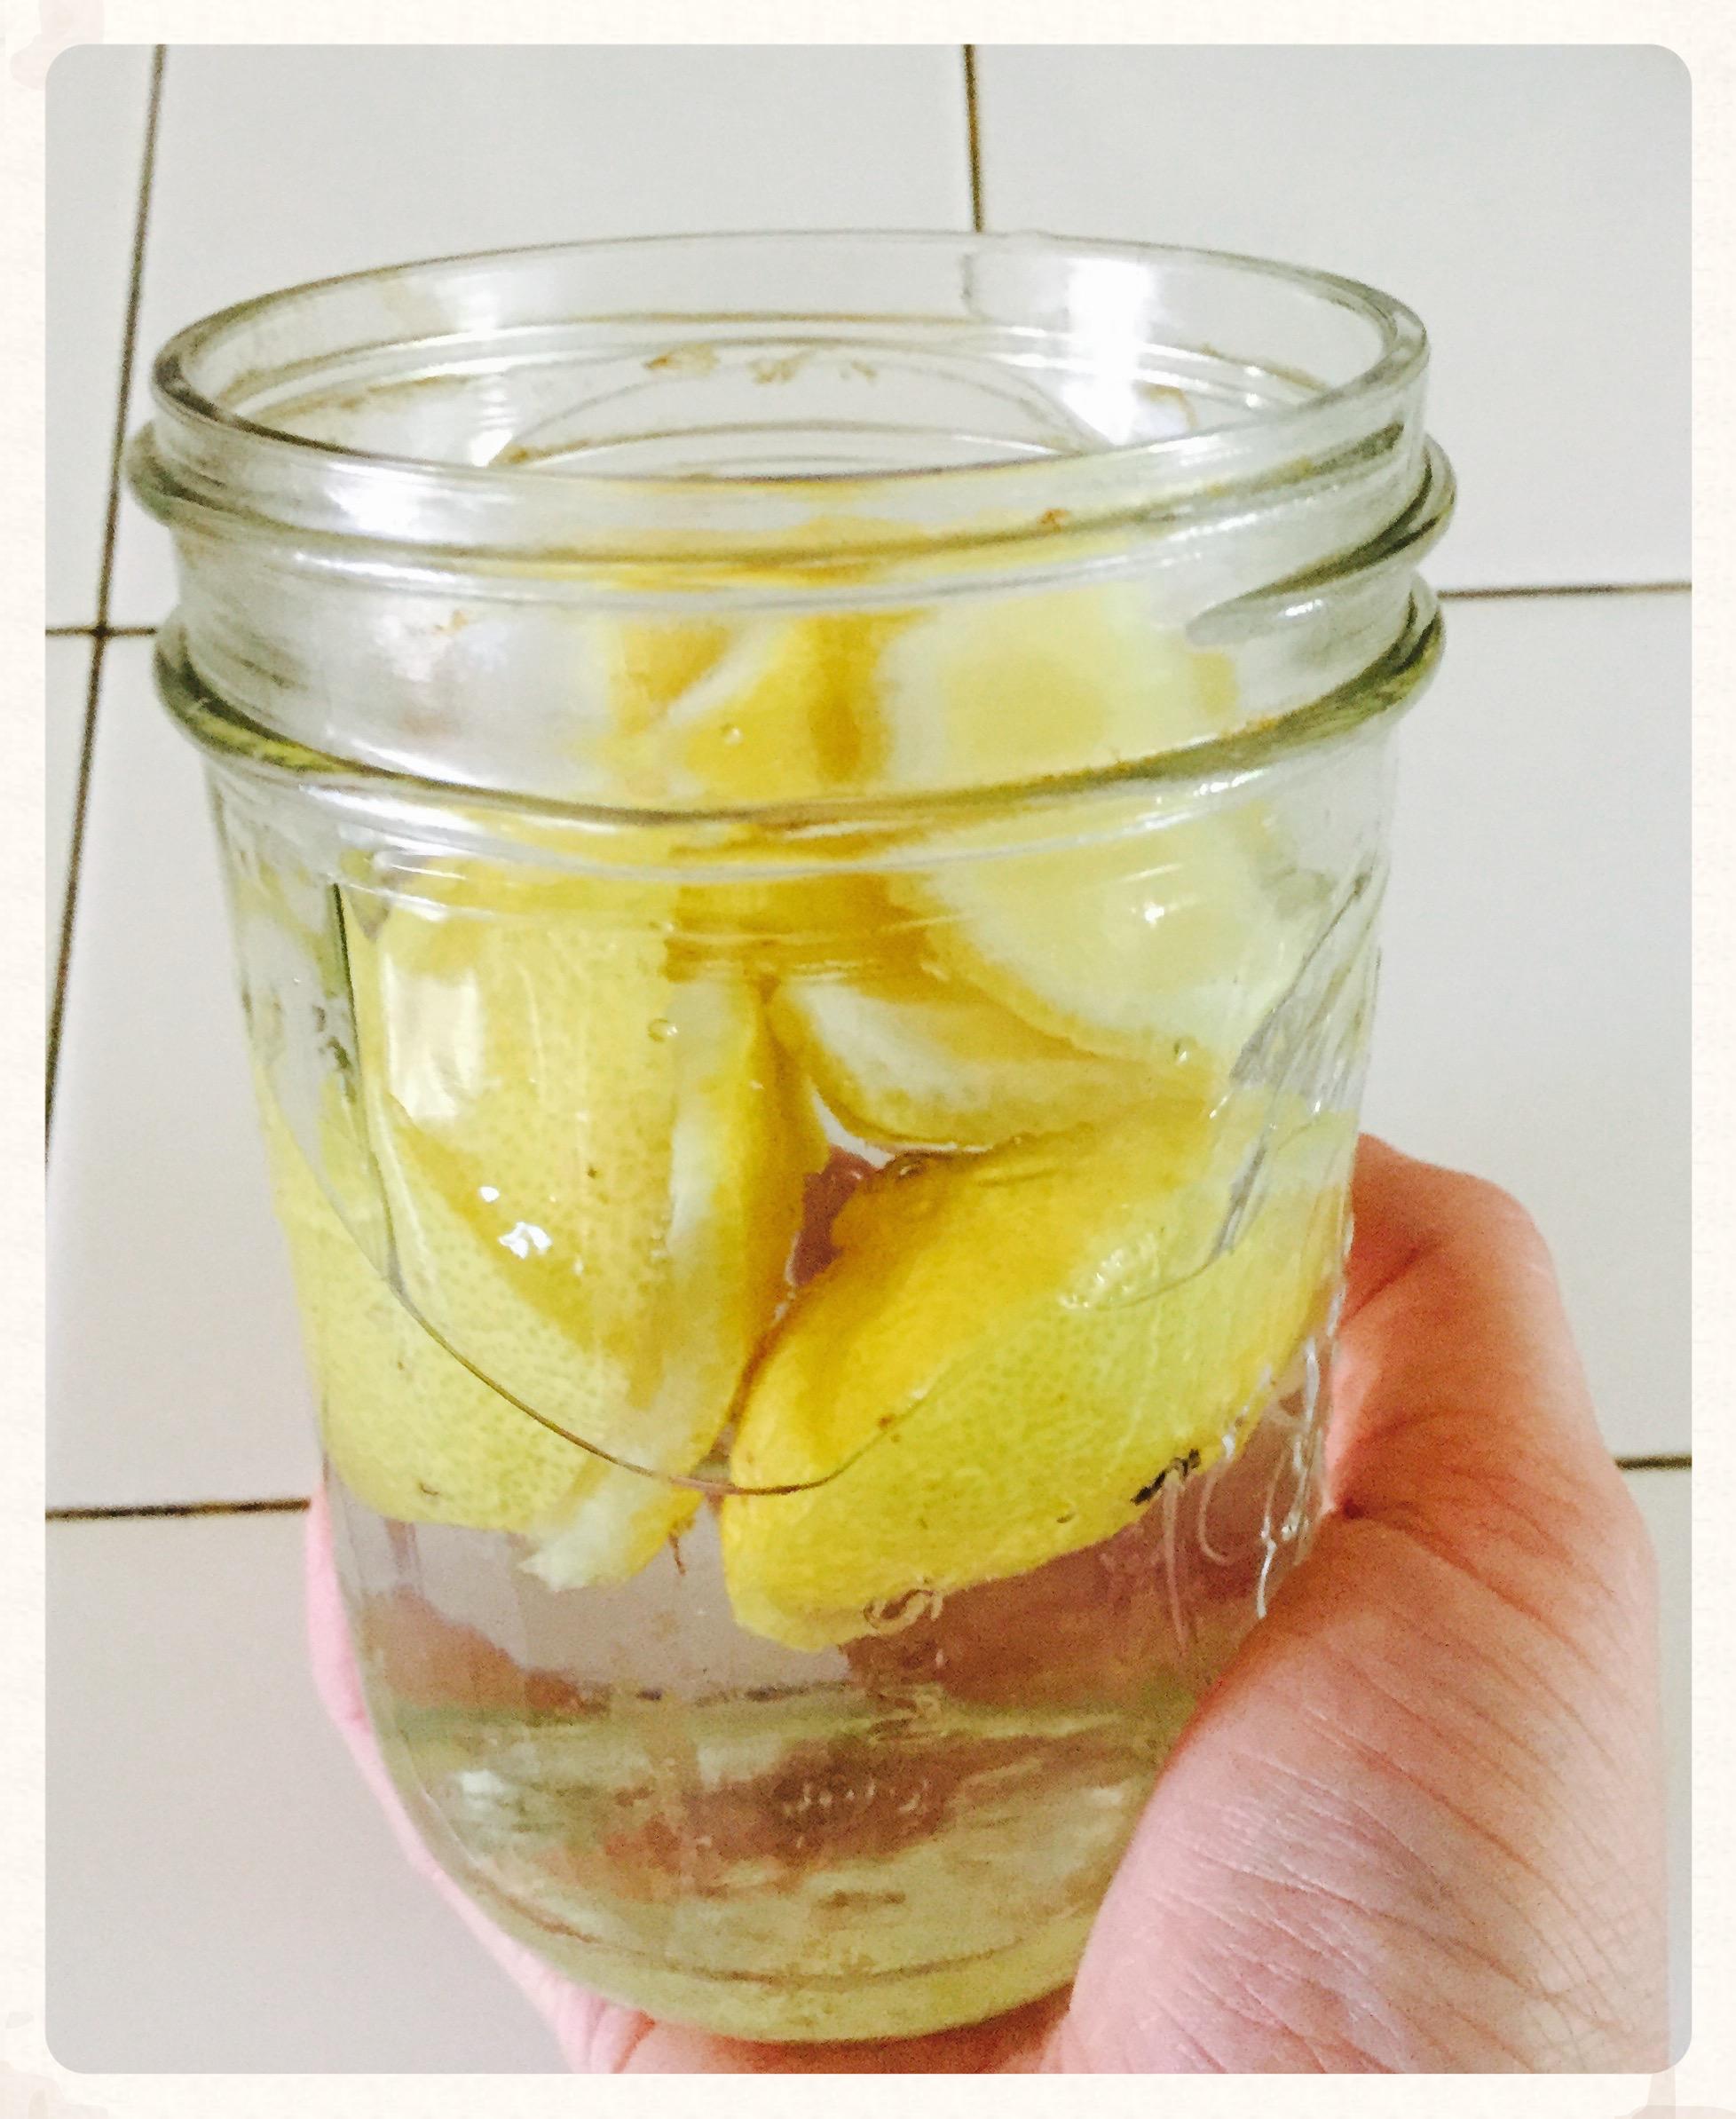 Infusing vinegar with lemon rinds.